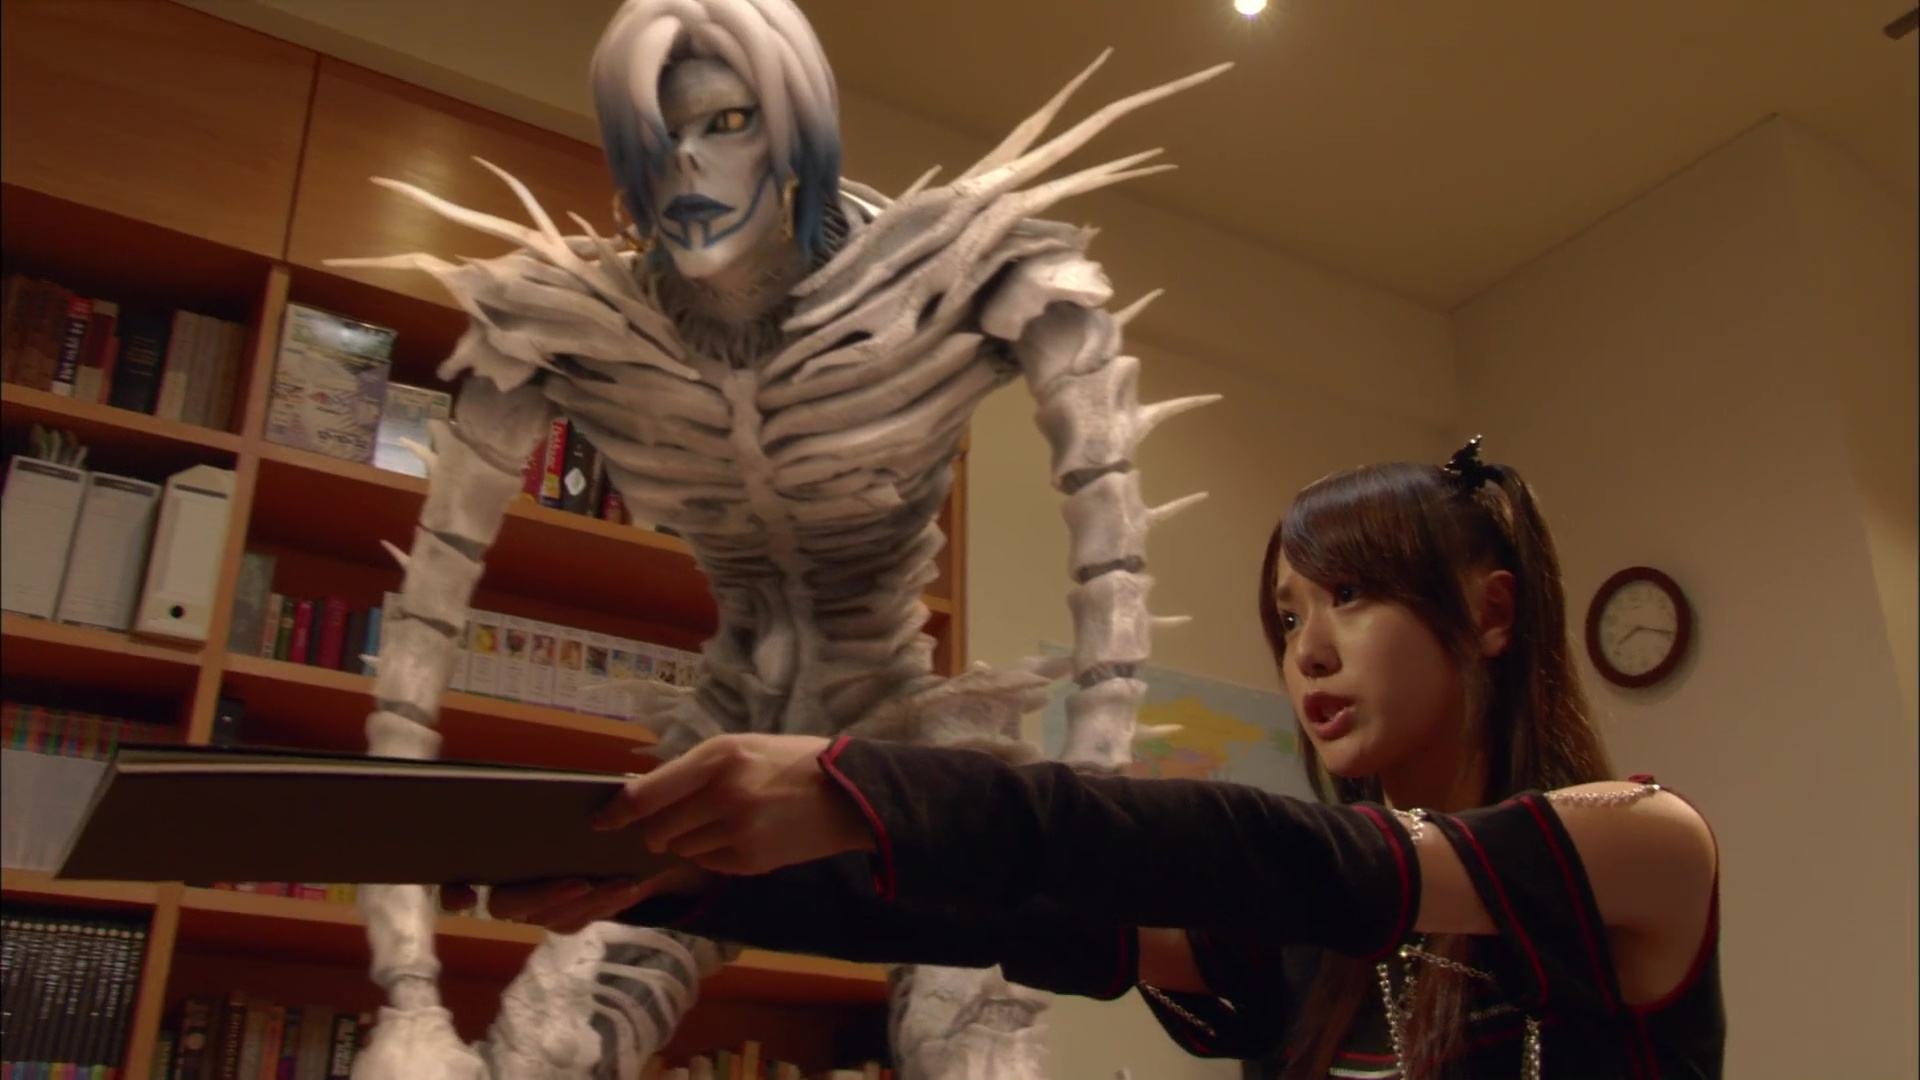 File:Death Note film- Misa and Rim.jpg